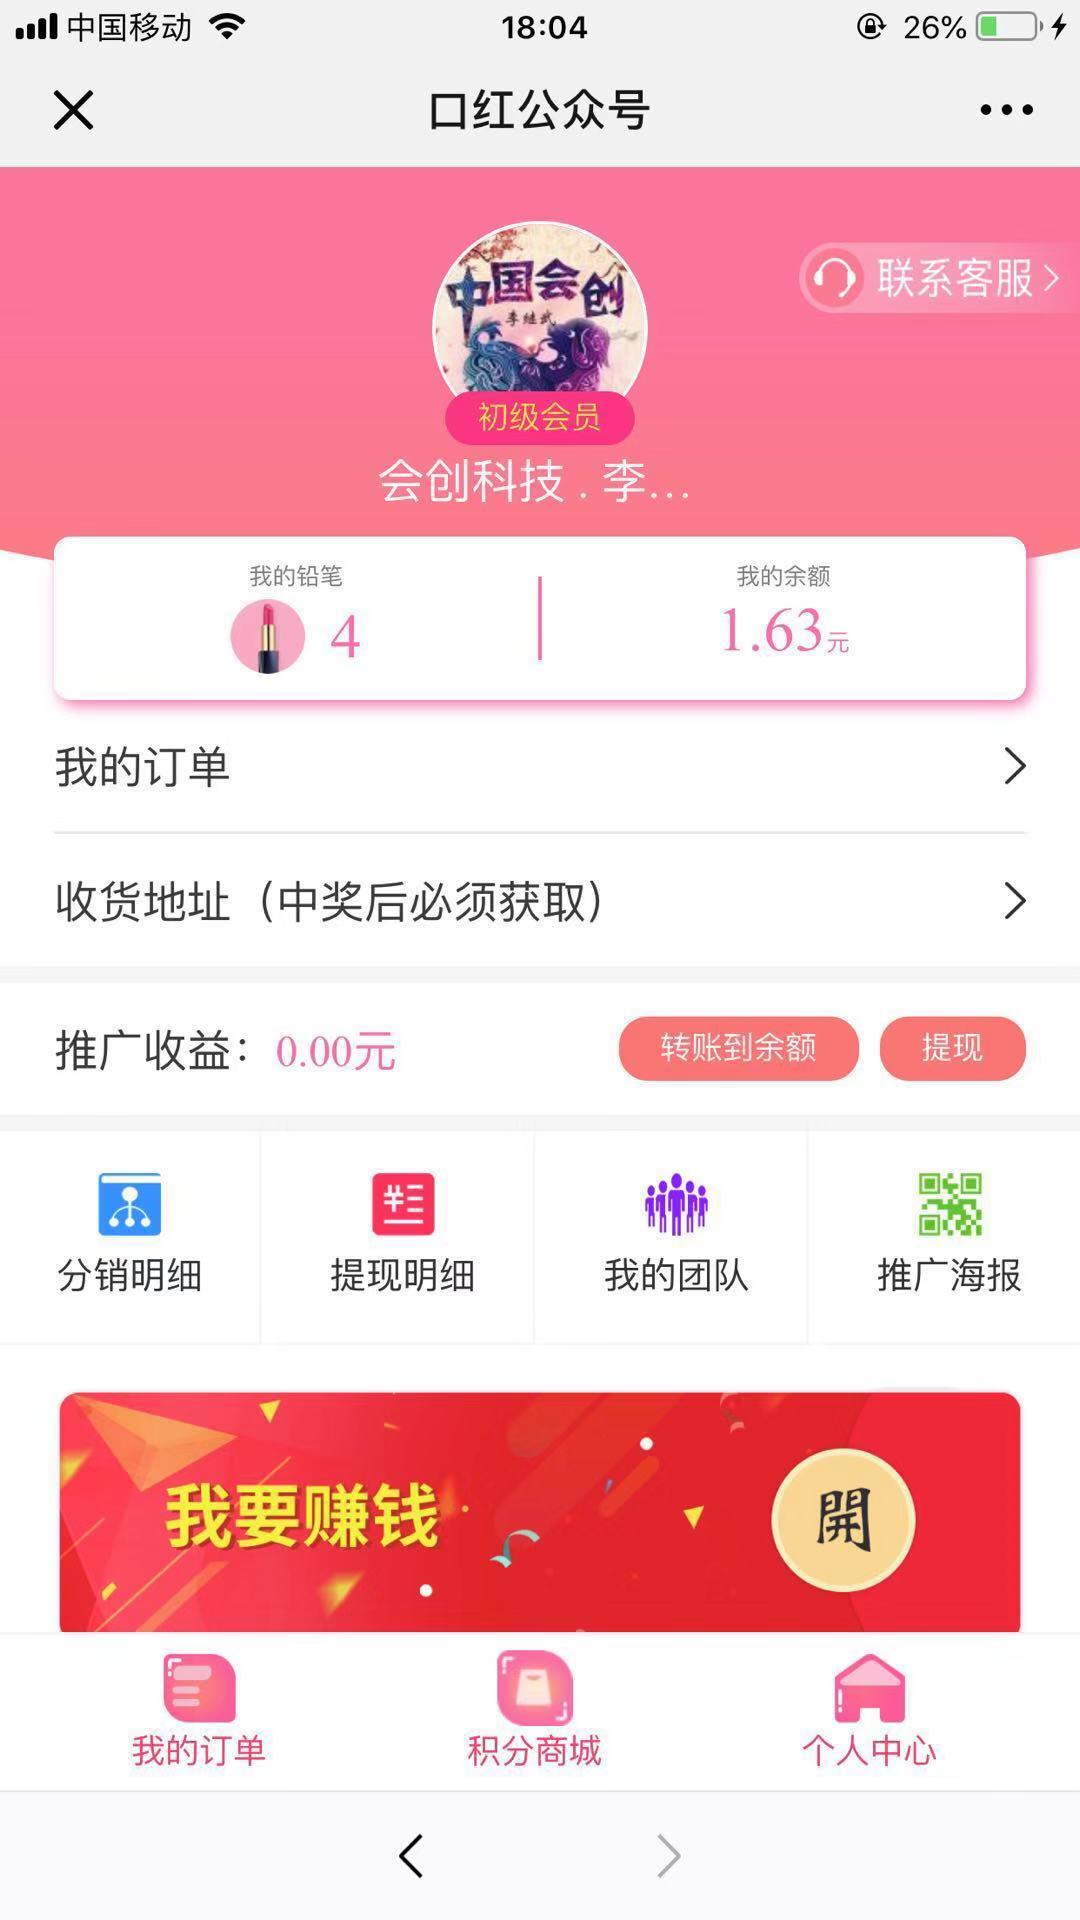 wq抖抖赢口红2.4.2支持H5个人免签支付-渔枫源码分享网